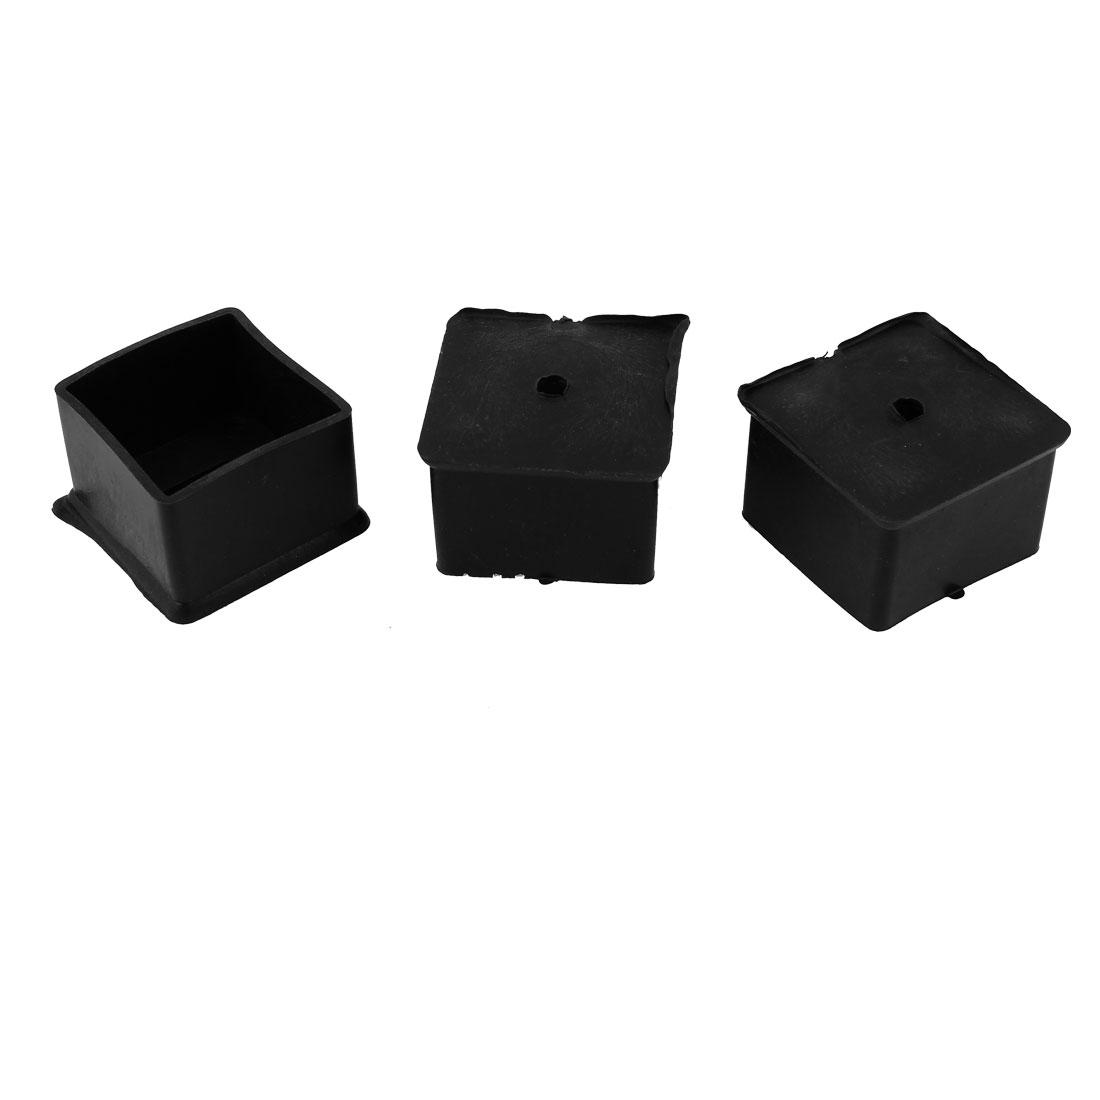 40mmx40mm Square Furniture Leg Protection Rubber Chair Feet Ferrules Black 3Pcs